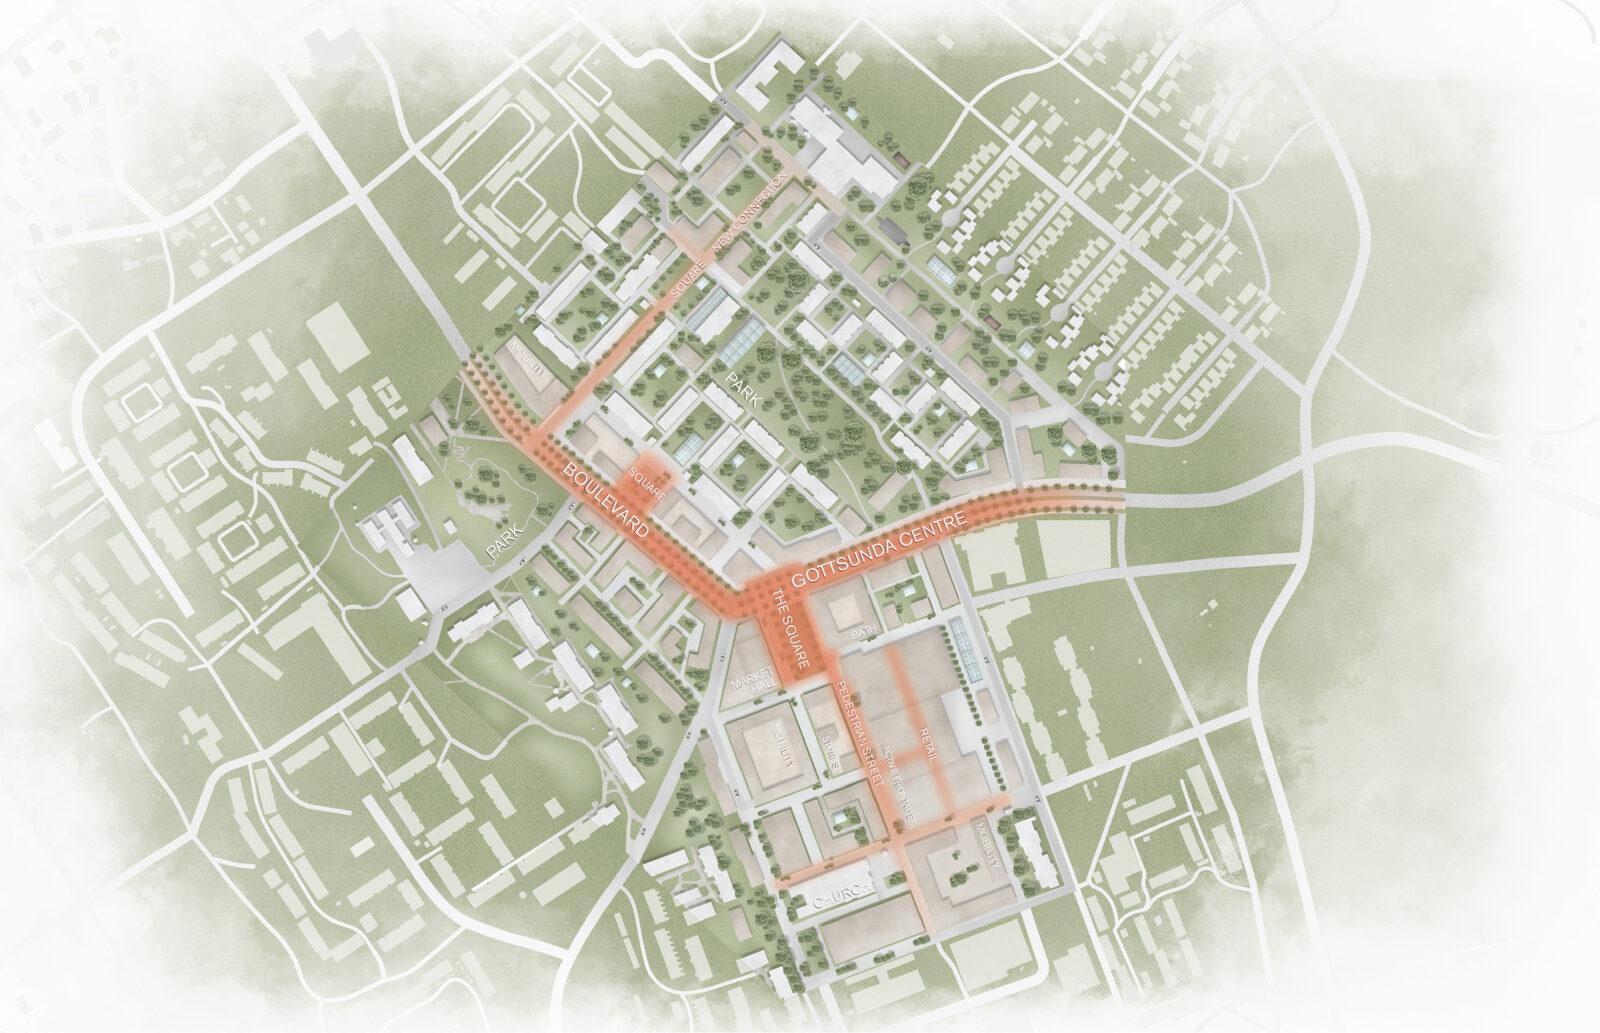 KjellanderSjoberg Gottsunda Site plan Eng 3600x2324px